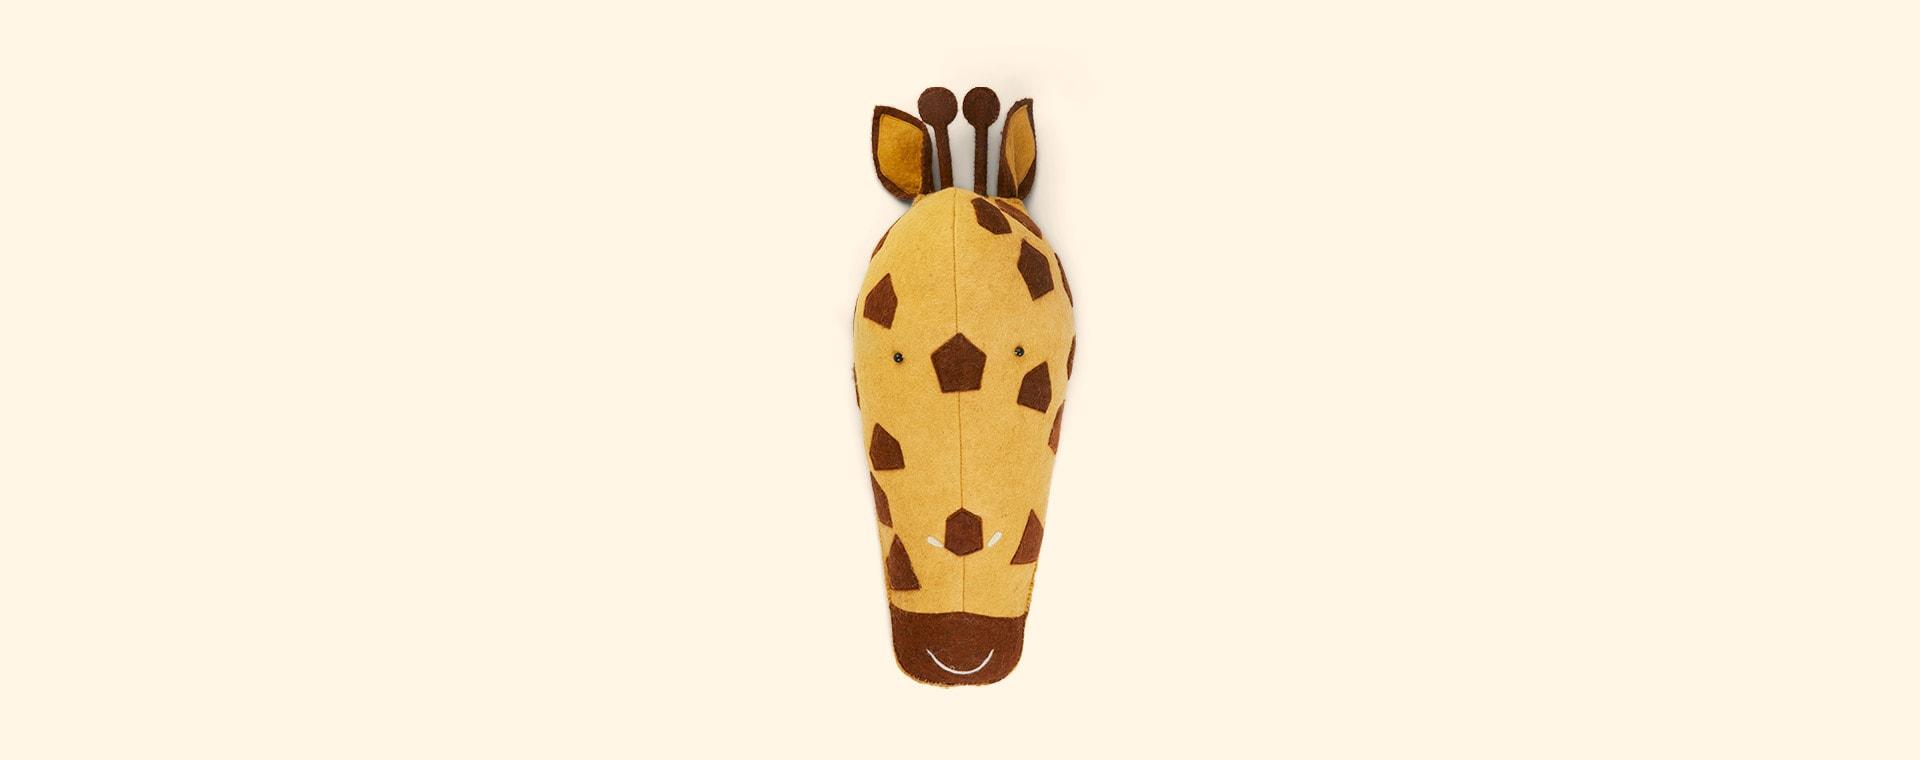 Giraffe Kids Depot Animal Head Wall Decor